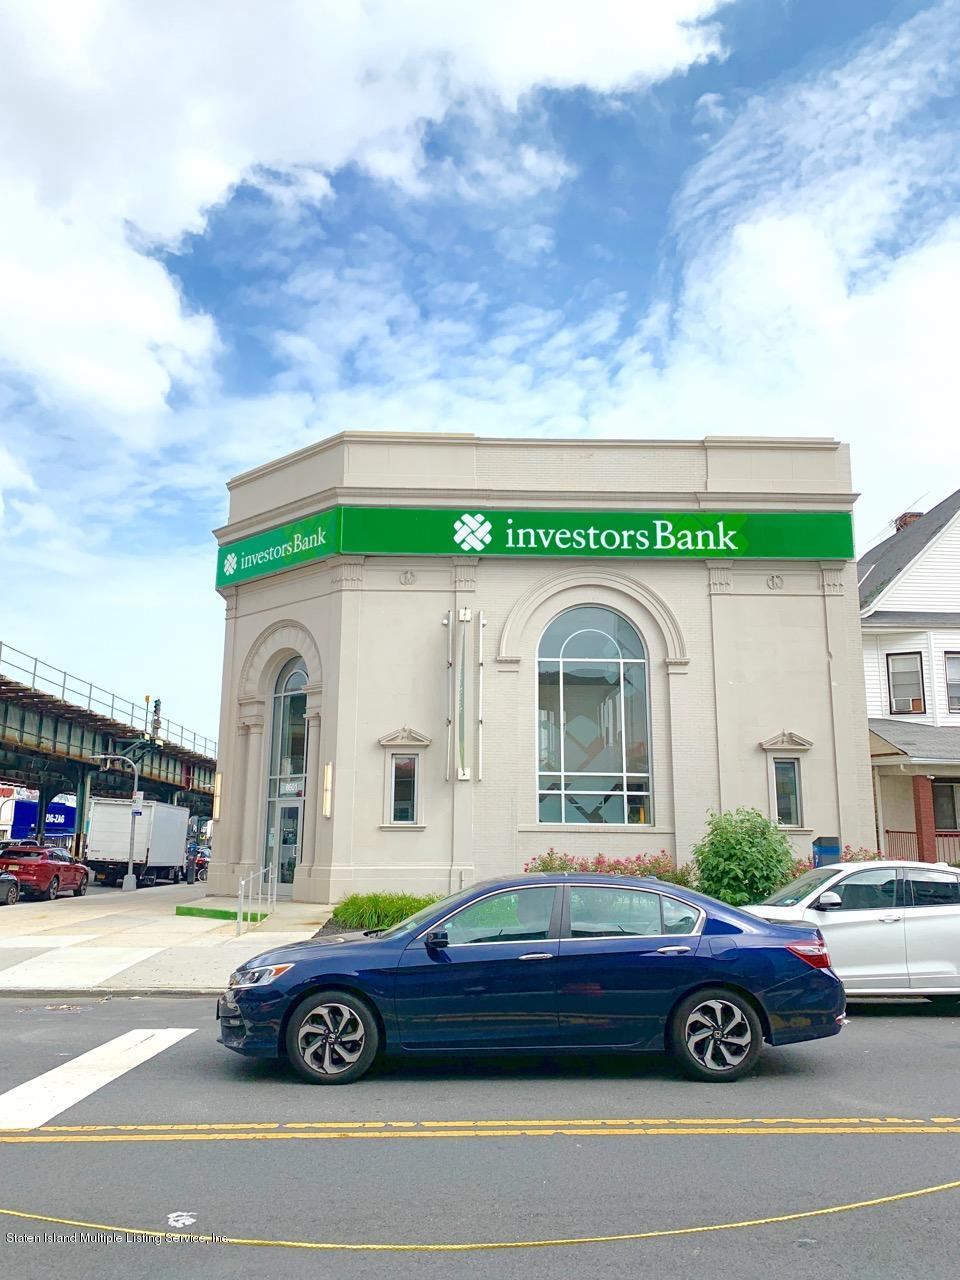 Bensonhurst Car Service >> Commercial In Bensonhurst 8601 21 Avenue Brooklyn Ny 11214 Mls